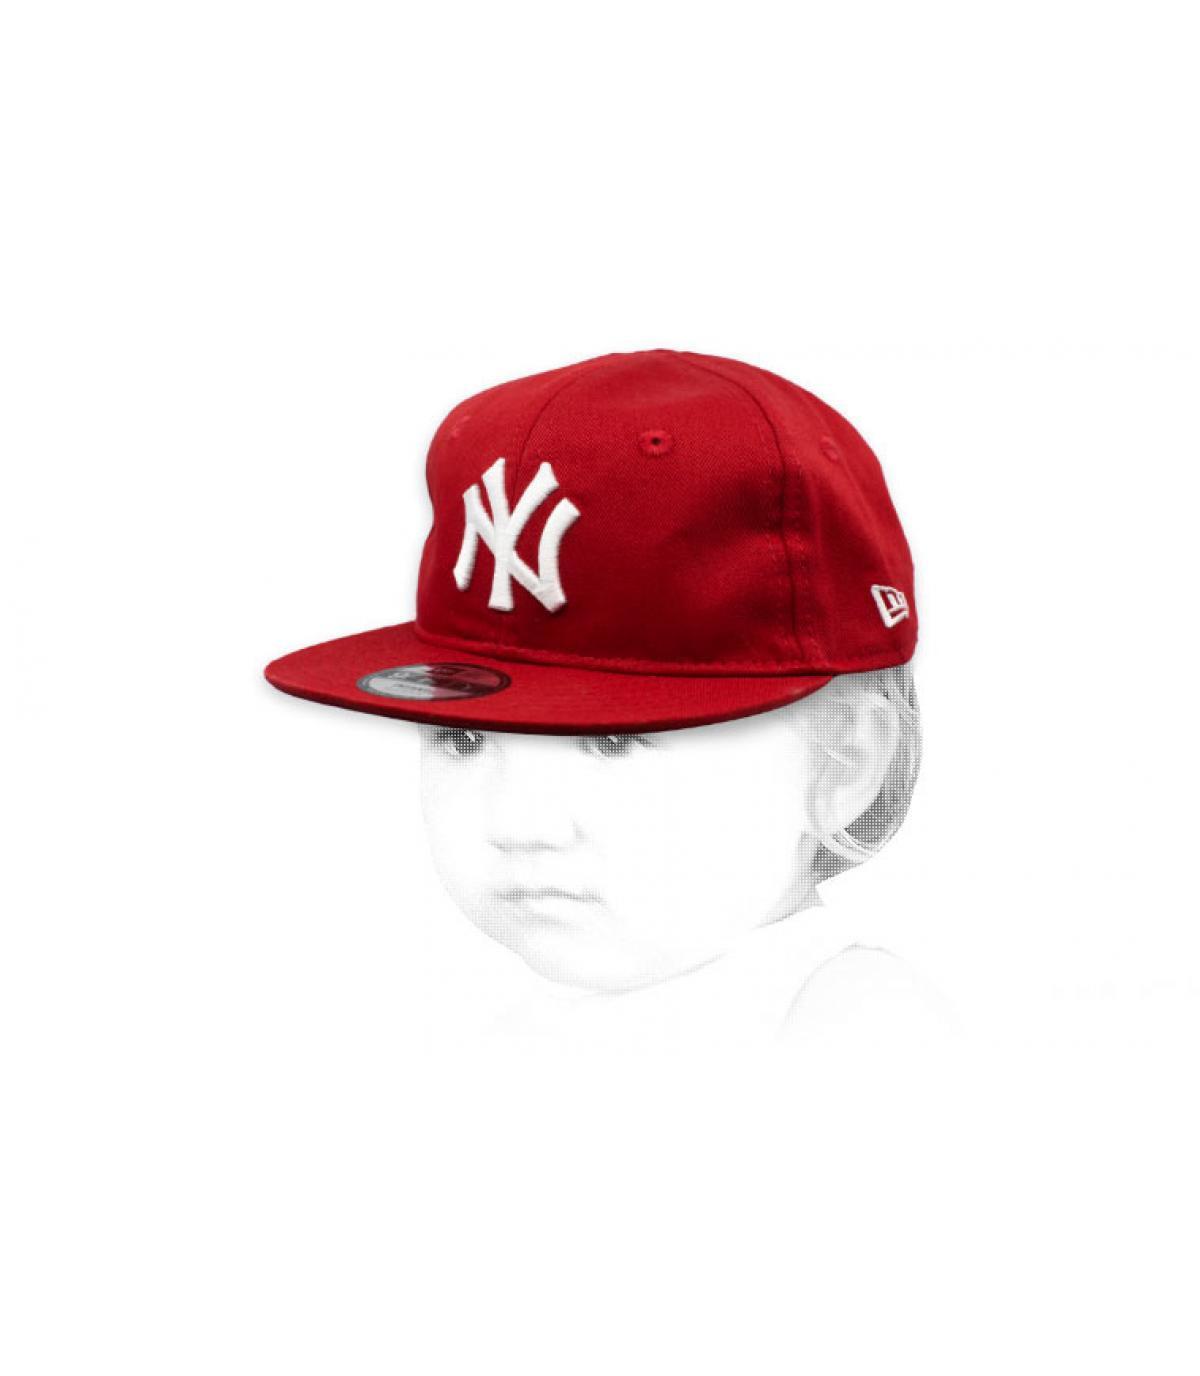 NY rood wit mutsje